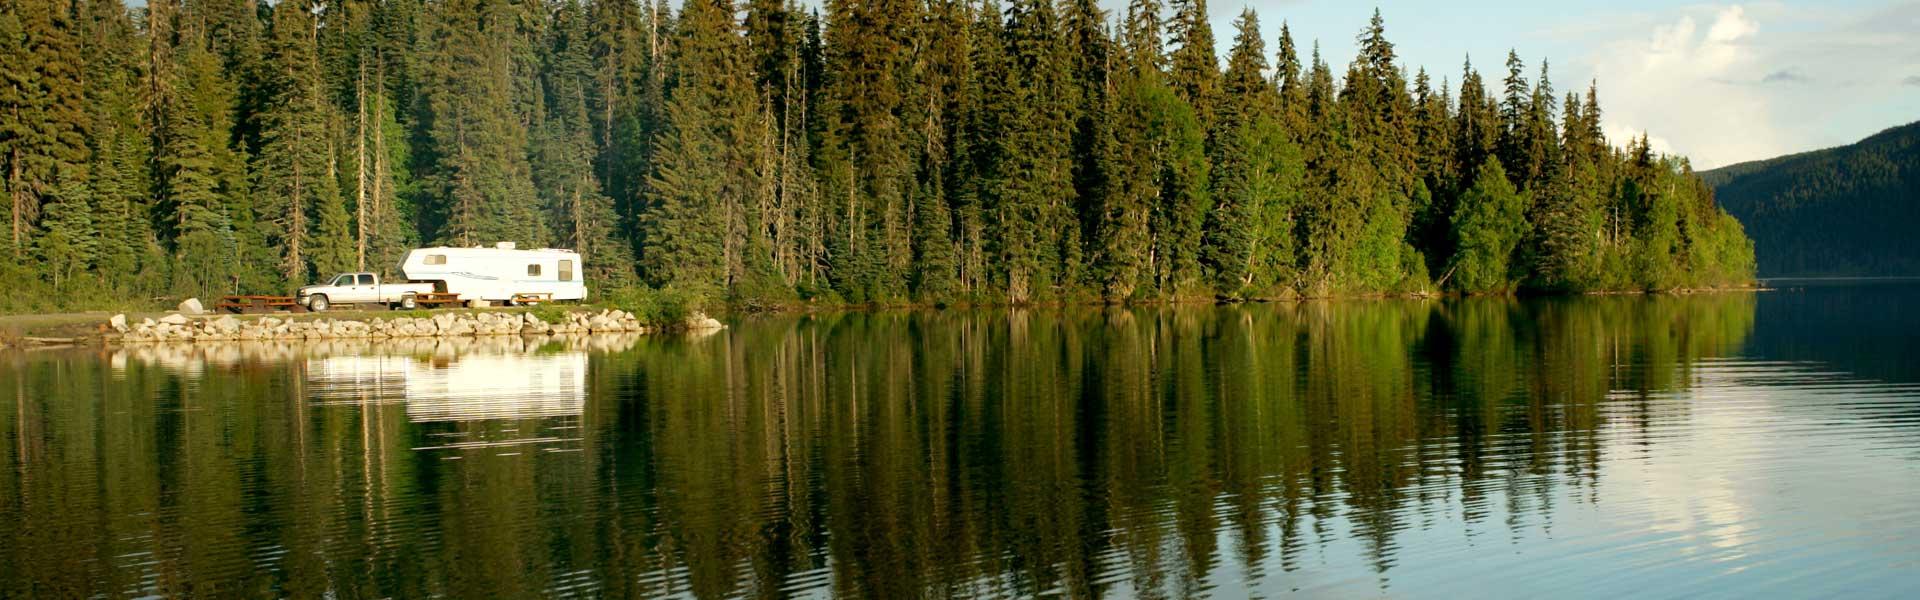 rv-camping-by-lake